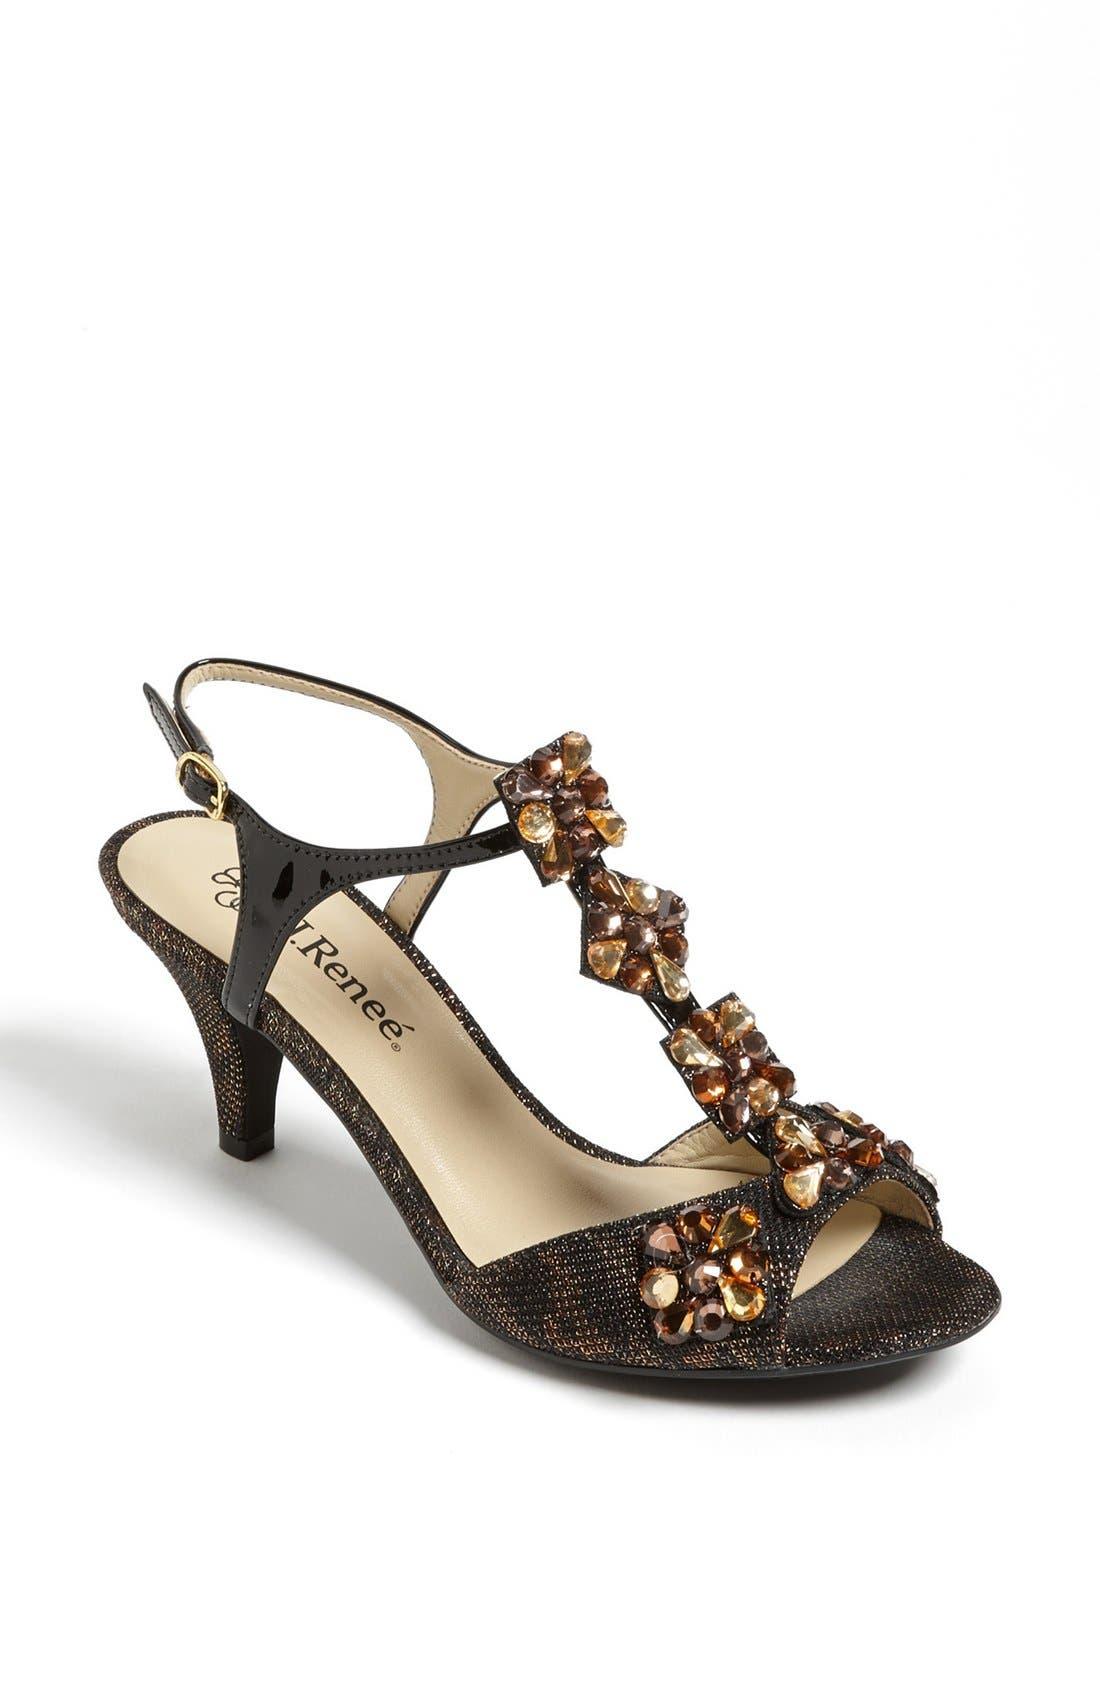 Main Image - J. Renee 'Raspy' Sandal (Online Only)